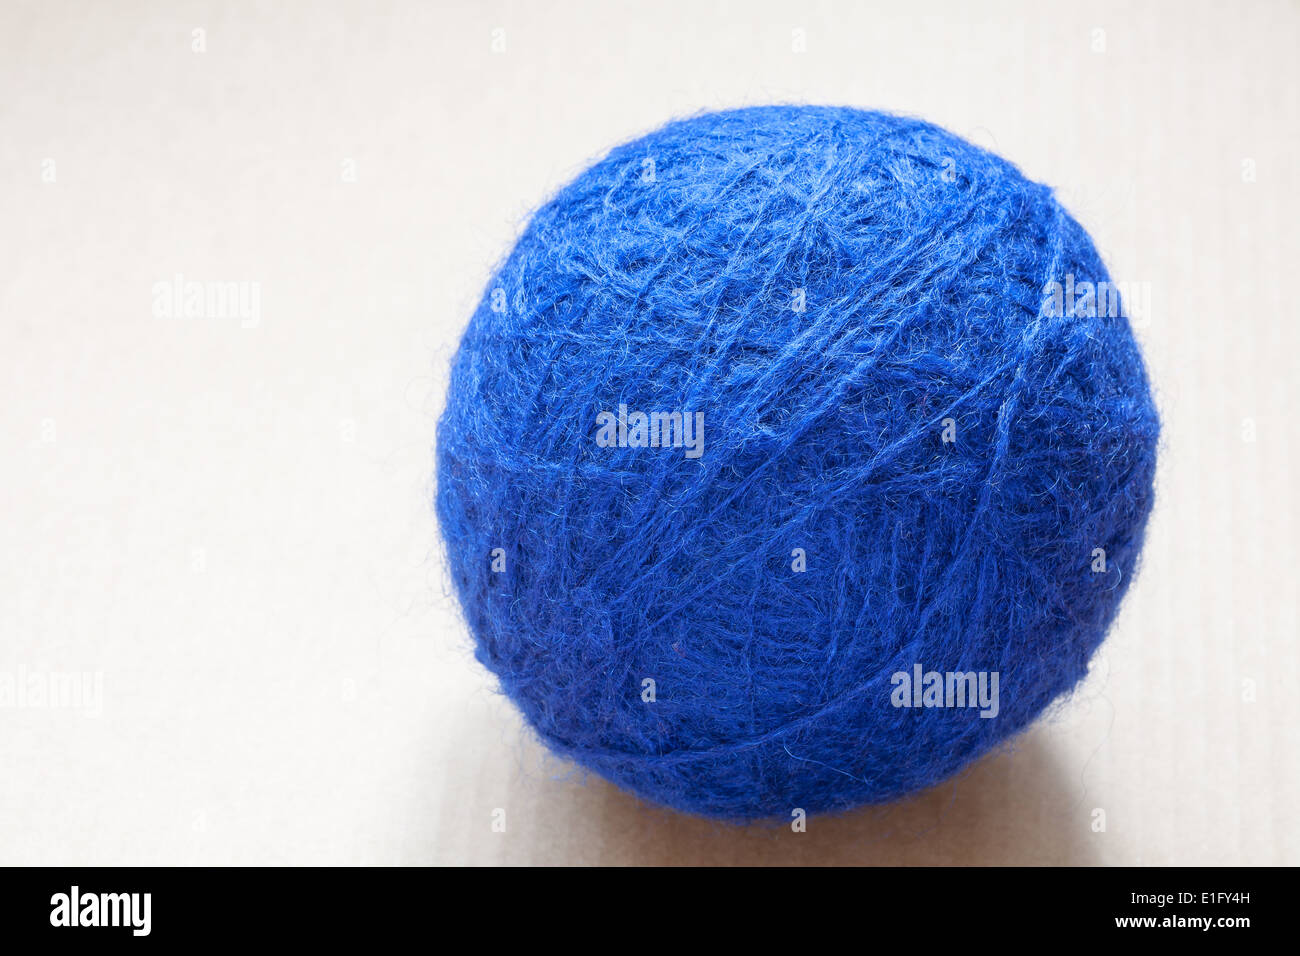 blue wool yarn skein on cardboard background - Stock Image